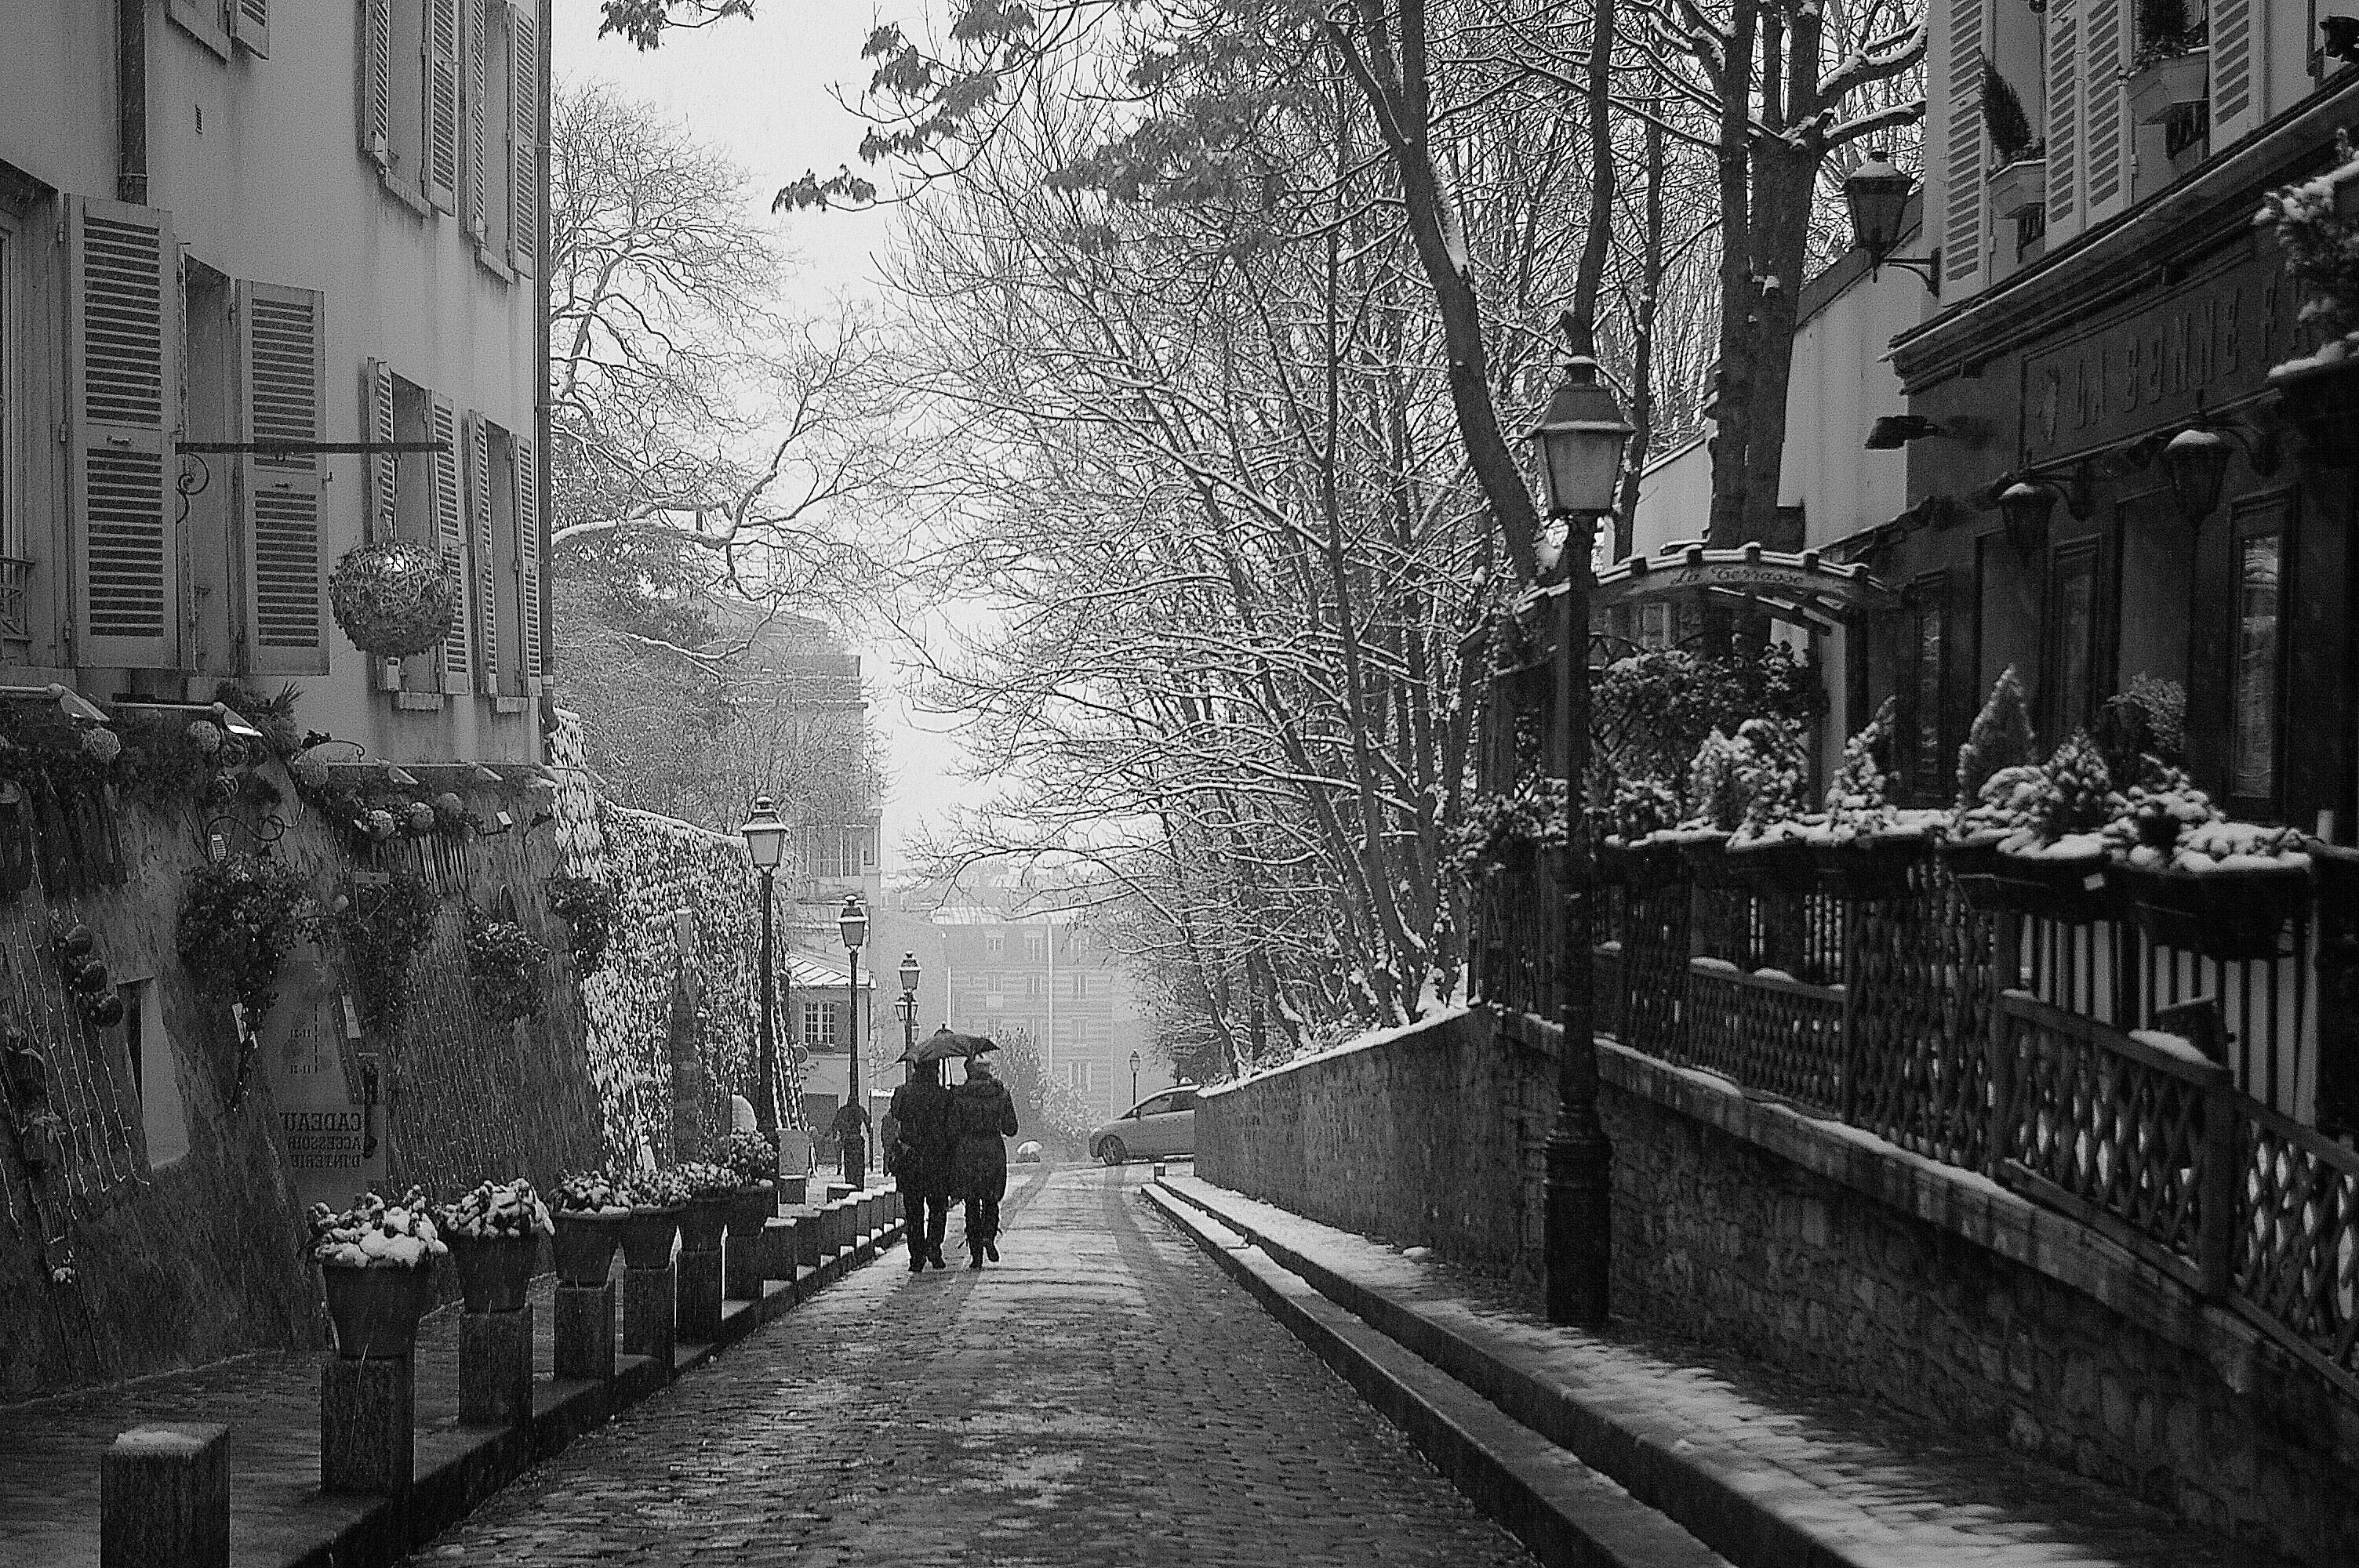 Couple-on-Street-in-Montmartre-1